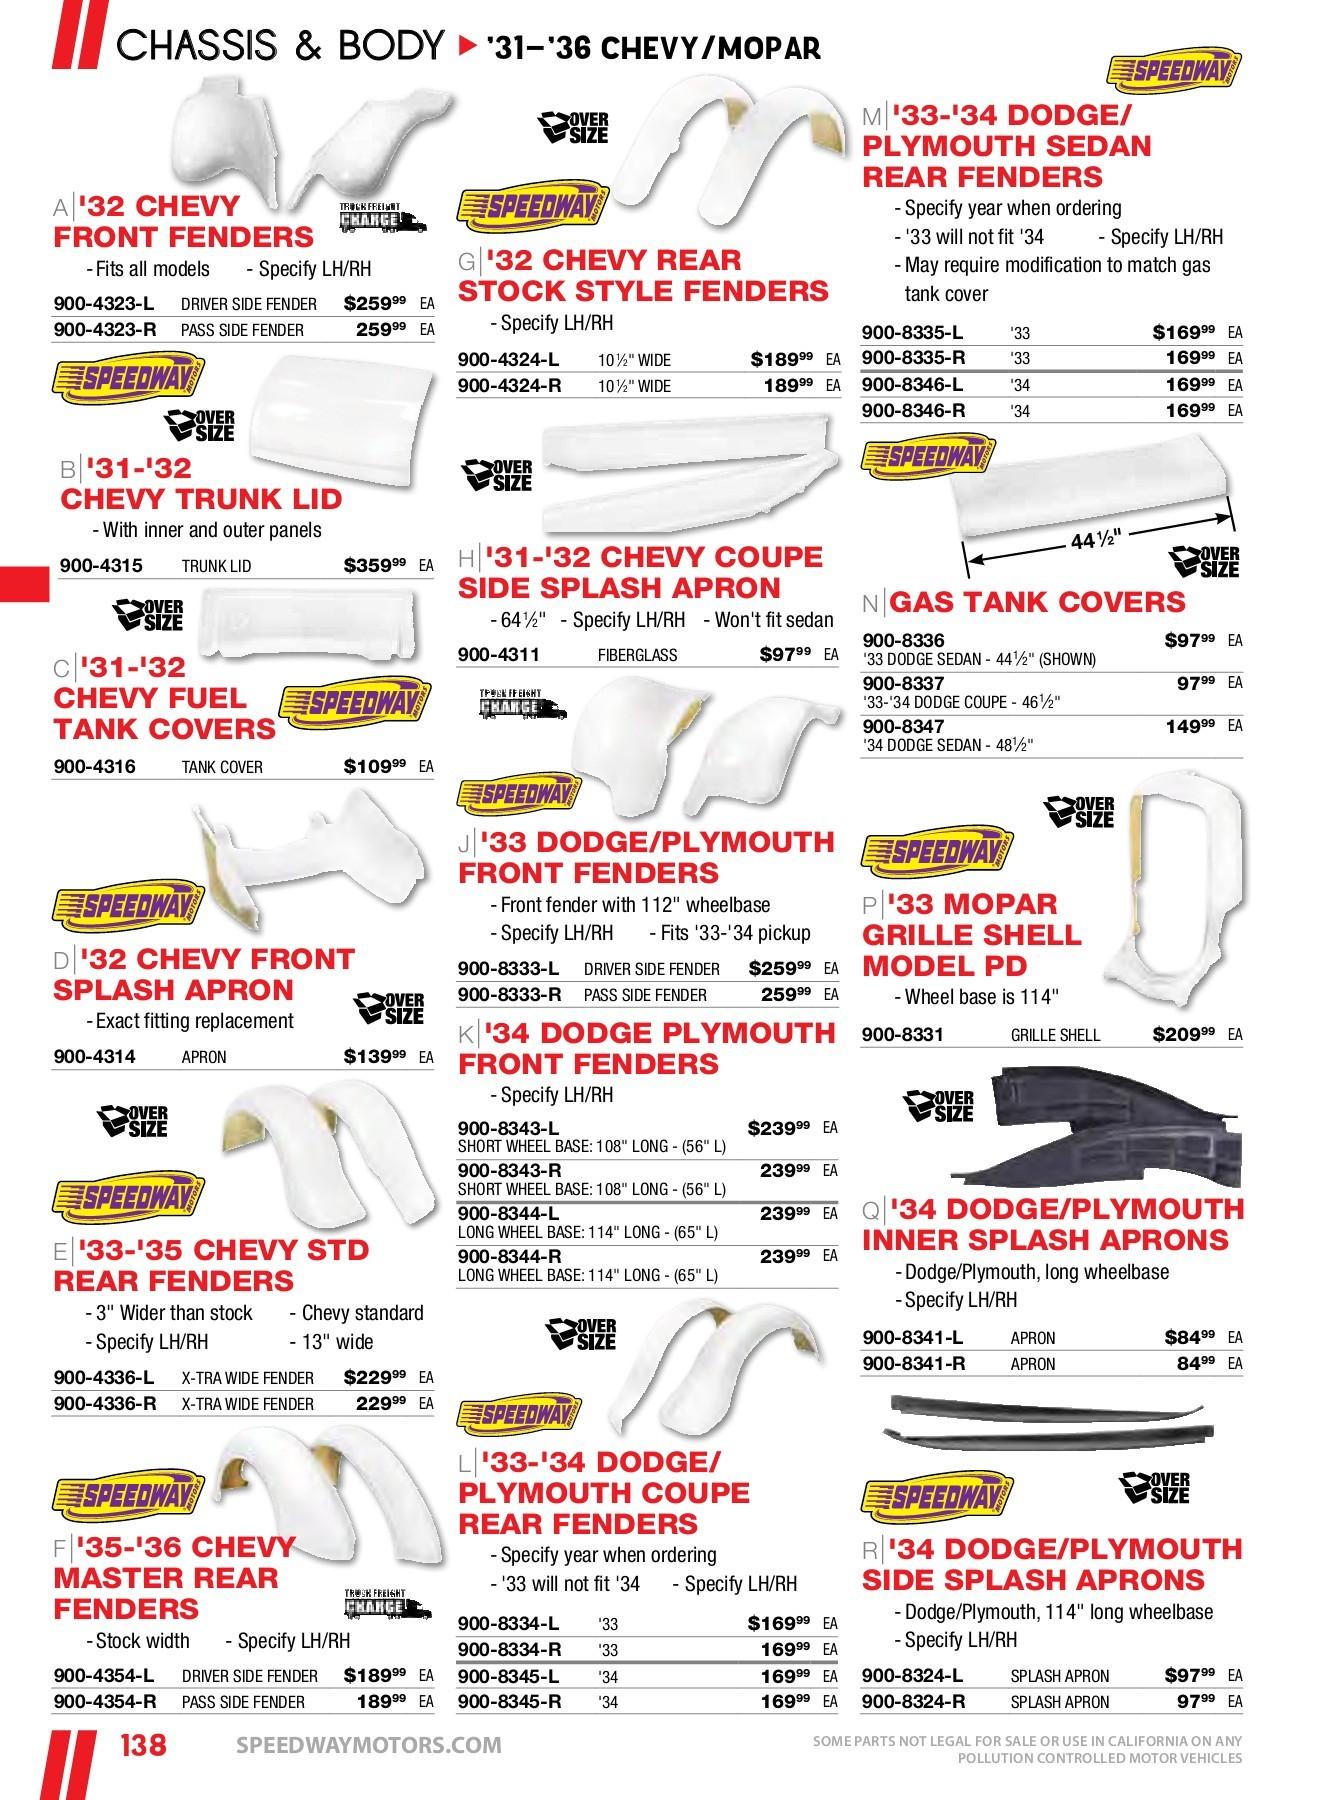 Yellow Firebird Wings American Shifter 31017 Ivory Shift Knob with 16mm x 1.5 Insert